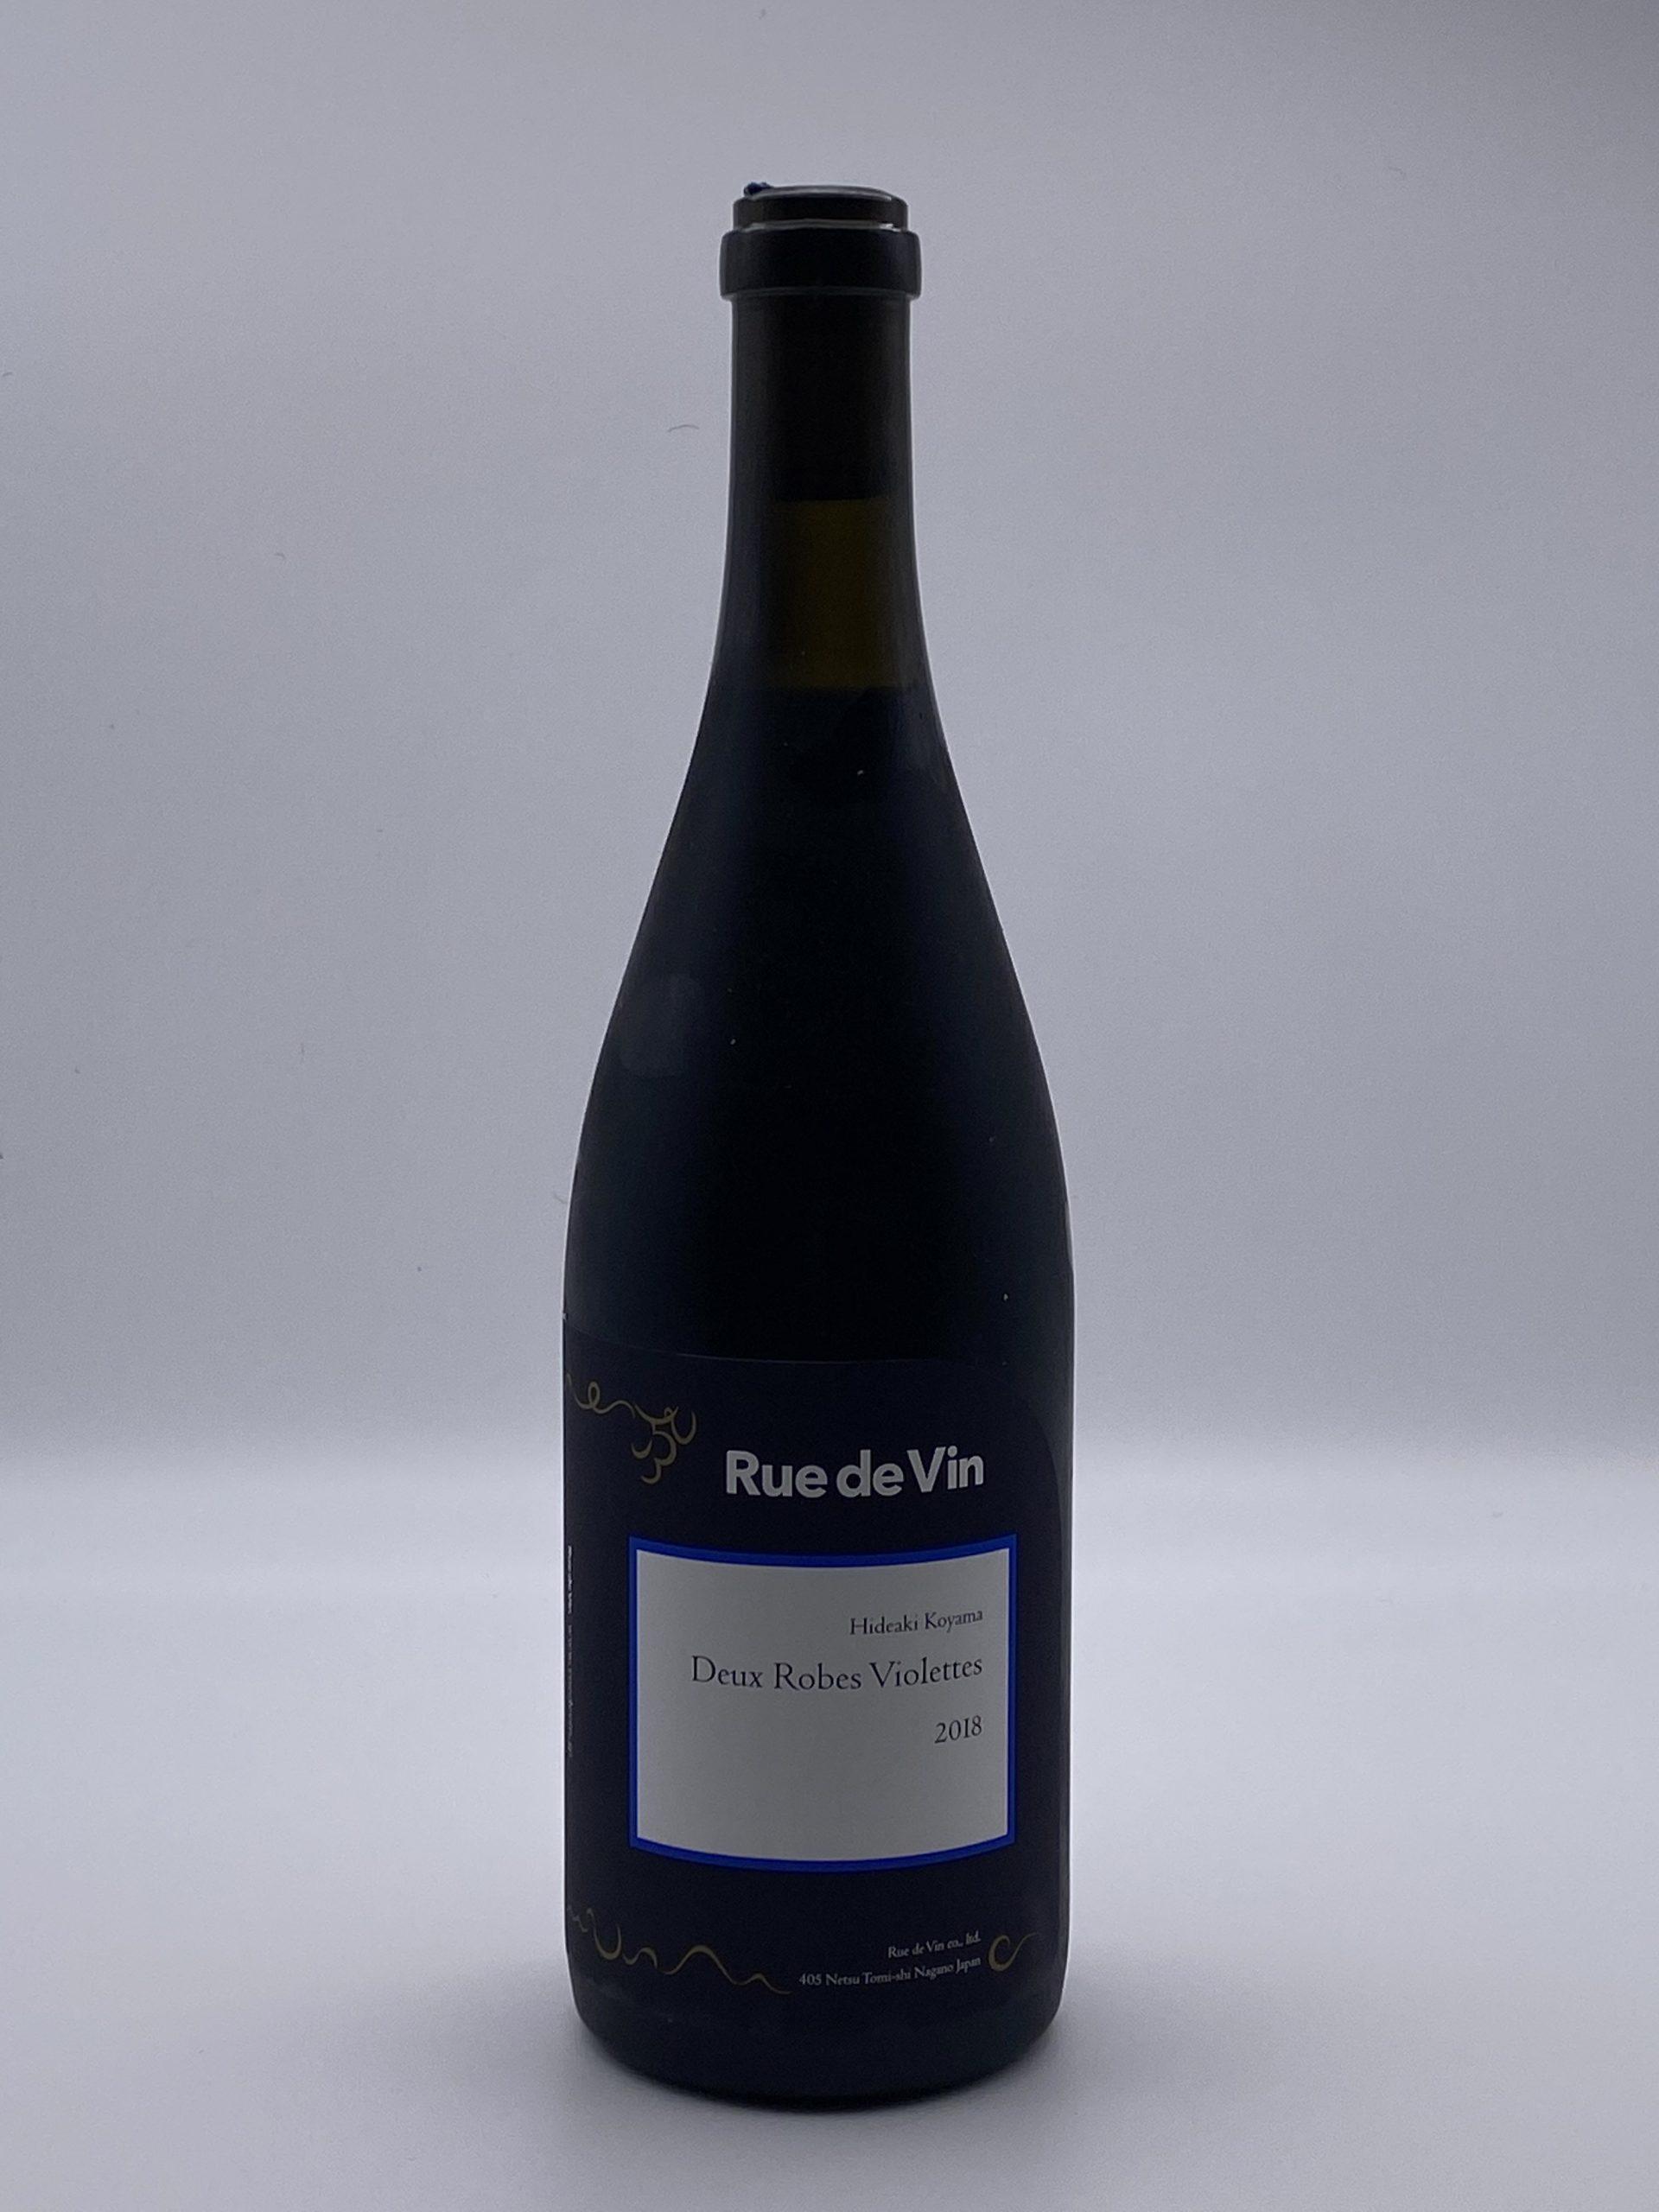 RU001